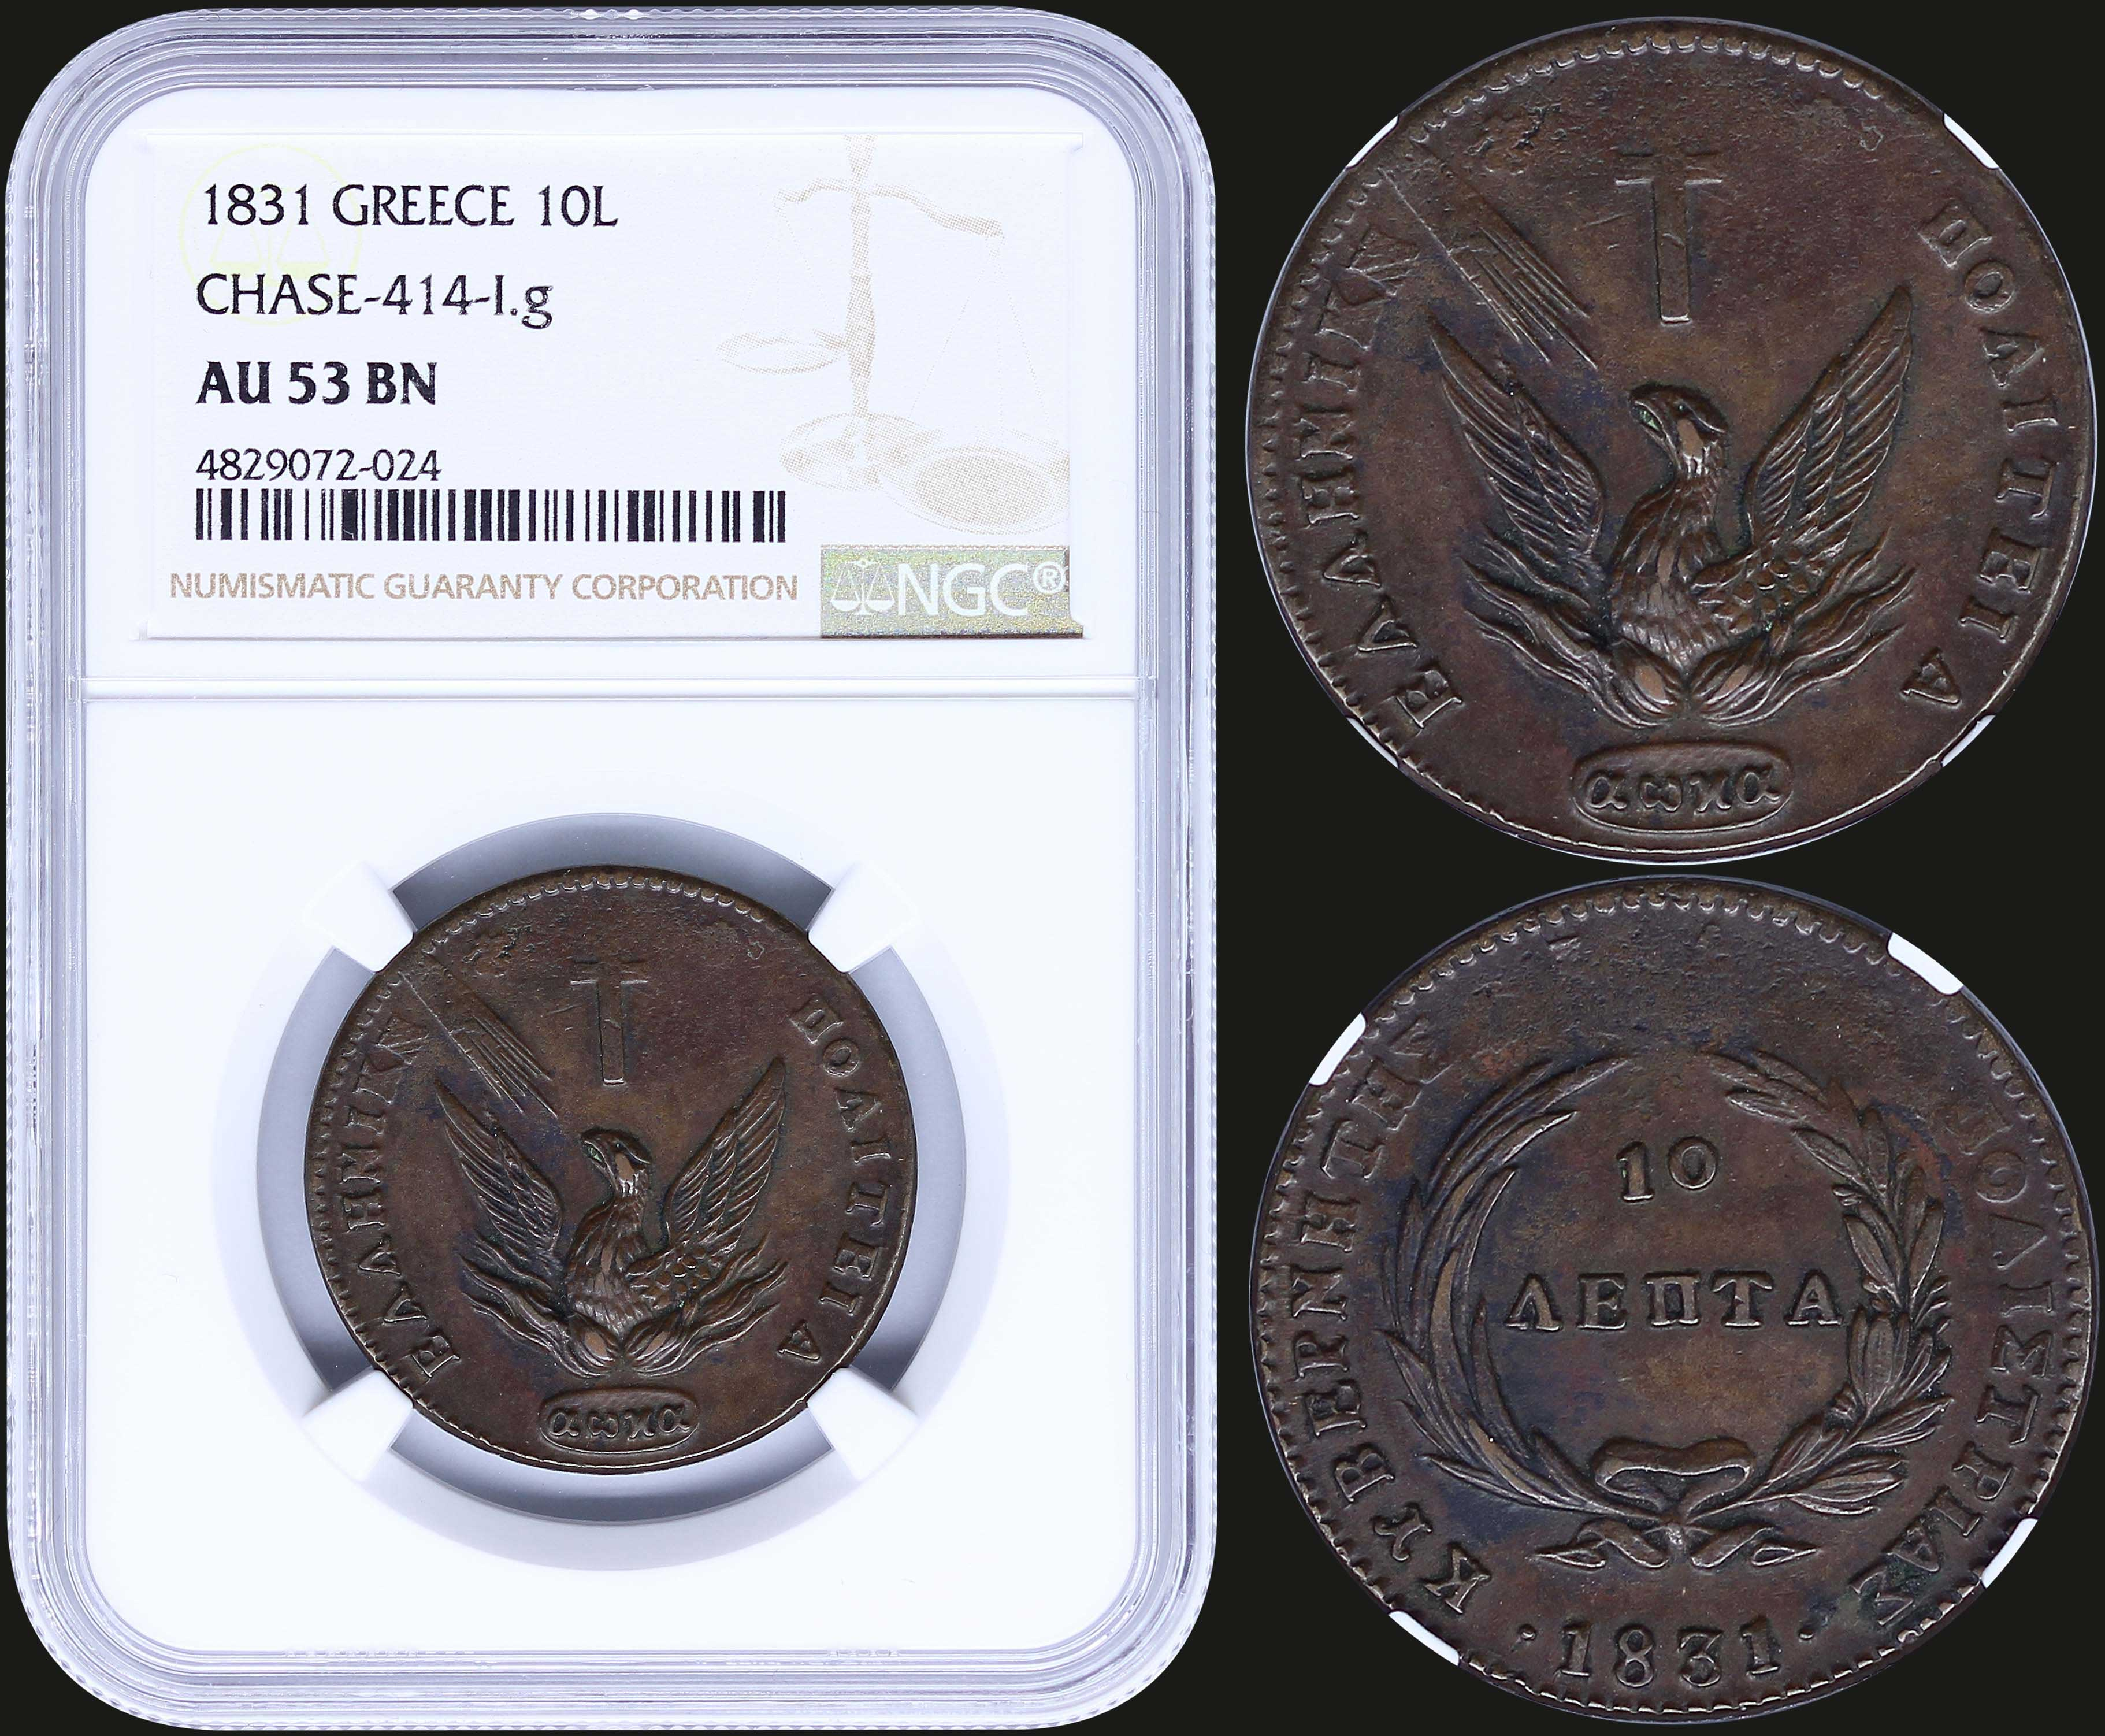 Lot 8036 - -  COINS & TOKENS governor capodistrias -  A. Karamitsos Public & Live Bid Auction 649 Coins, Medals & Banknotes